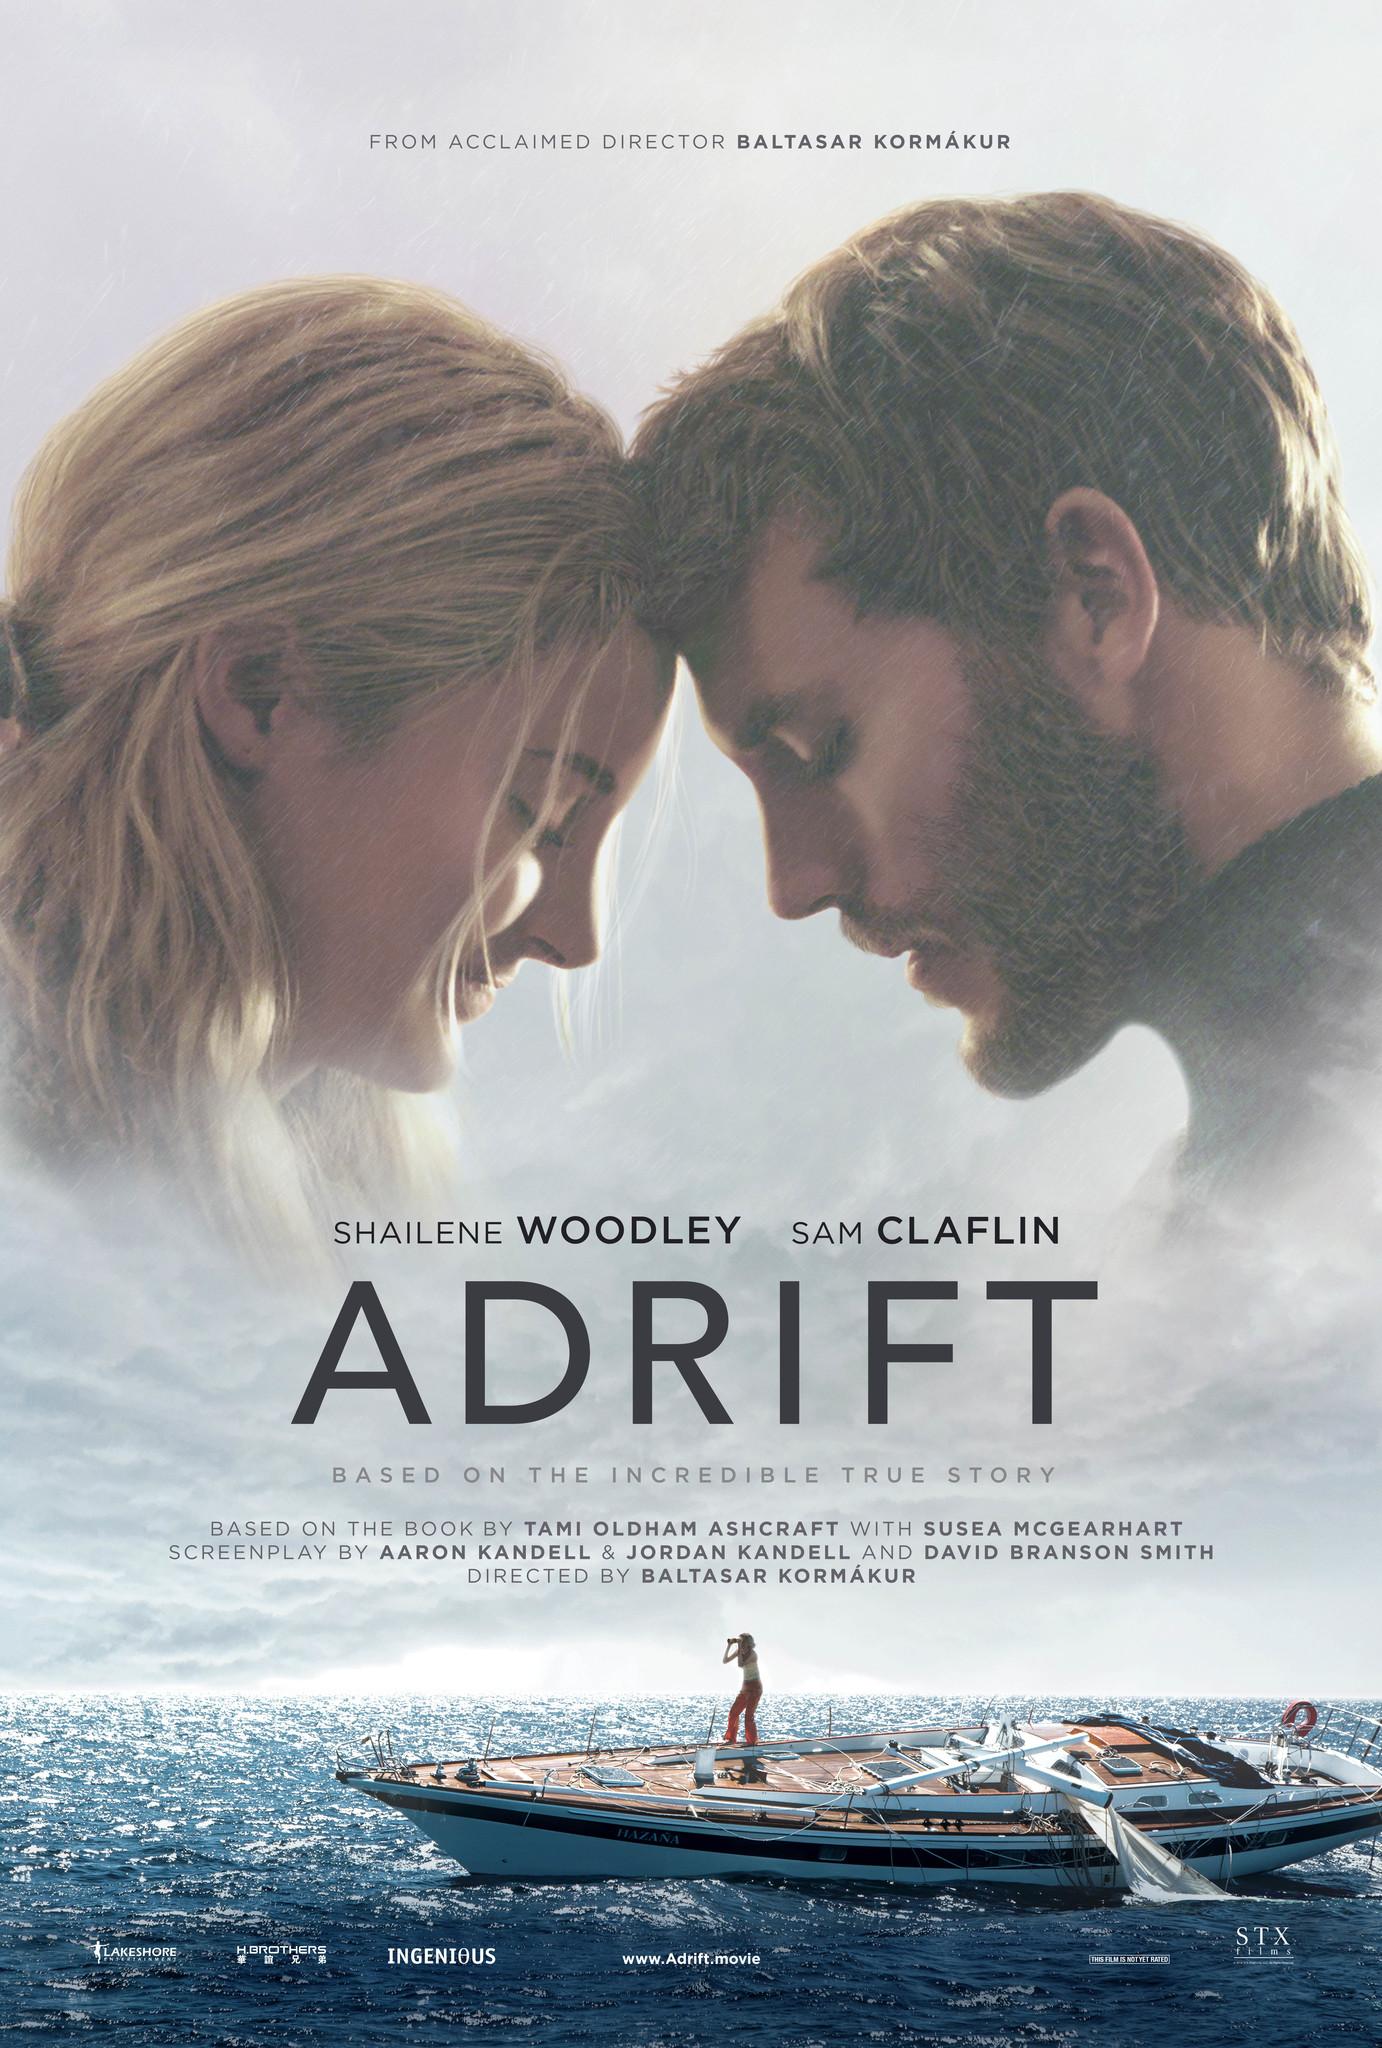 Adrift 2018 Hindi ORG Dual Audio 720p BluRay ESubs 900MB | 350MB Watch Online